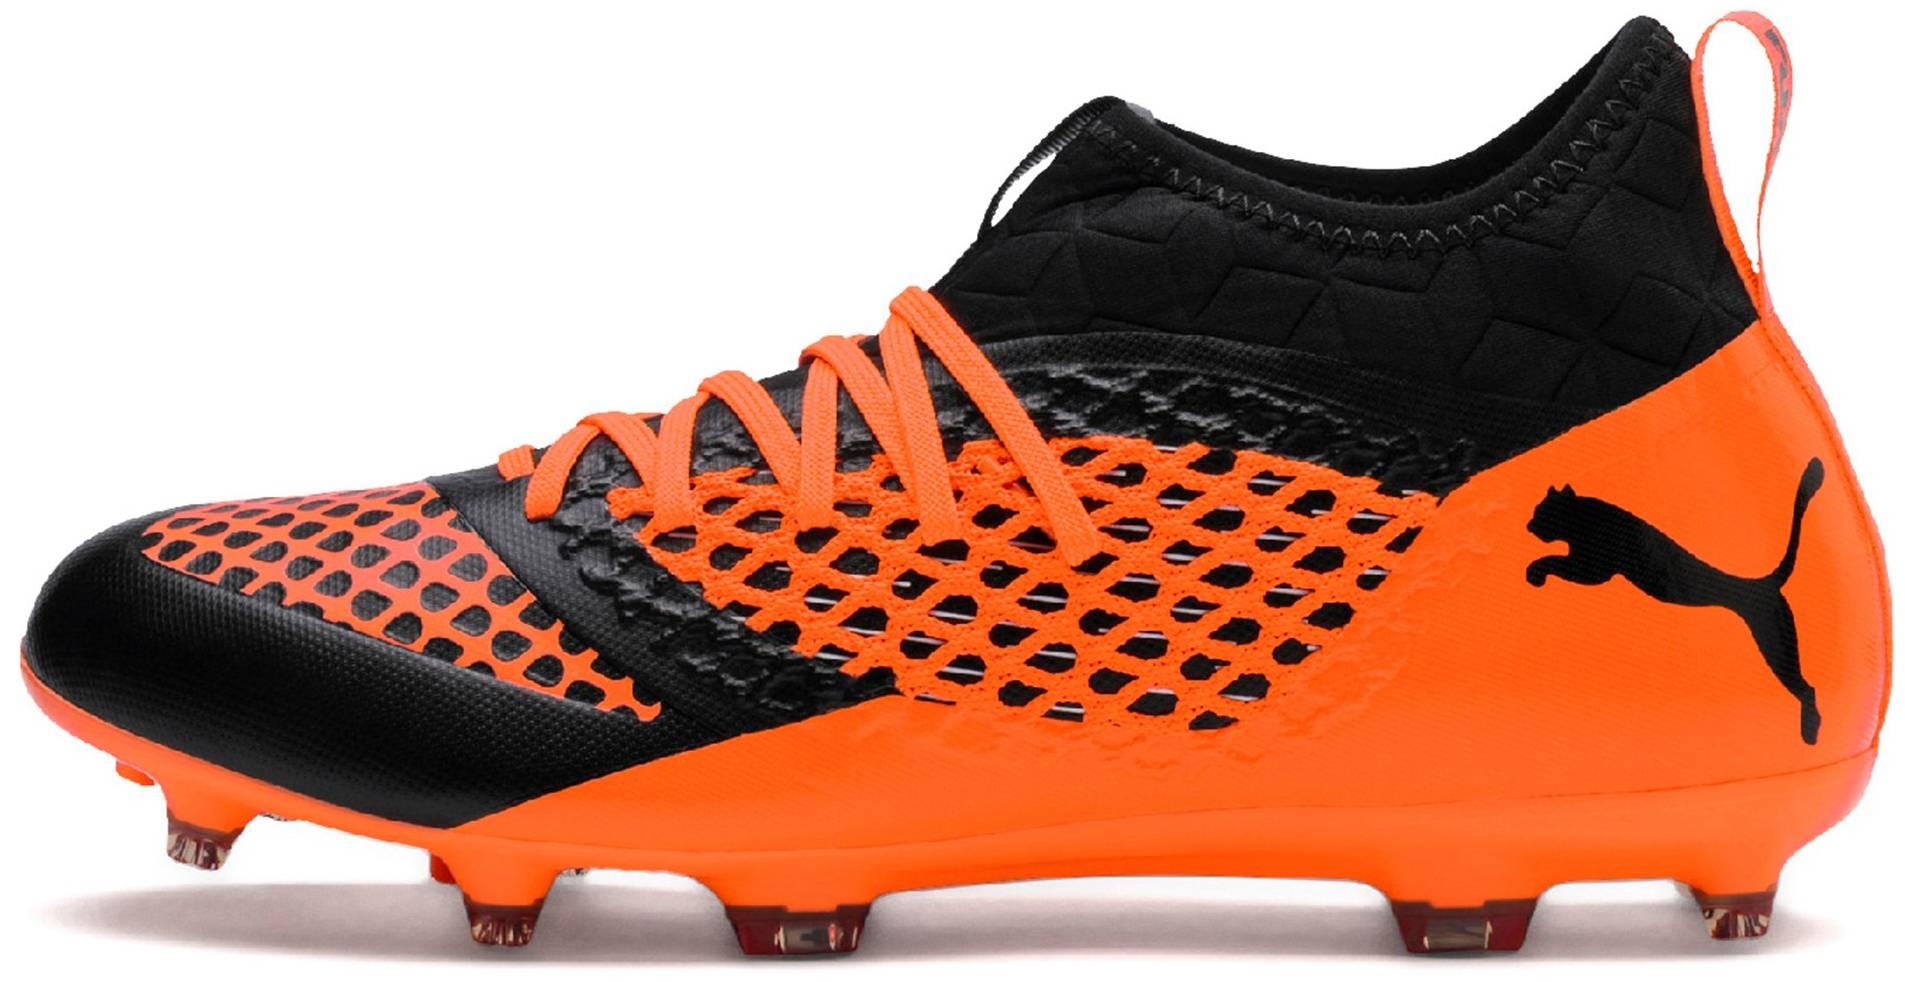 Save 55% on Orange Soccer Cleats (48